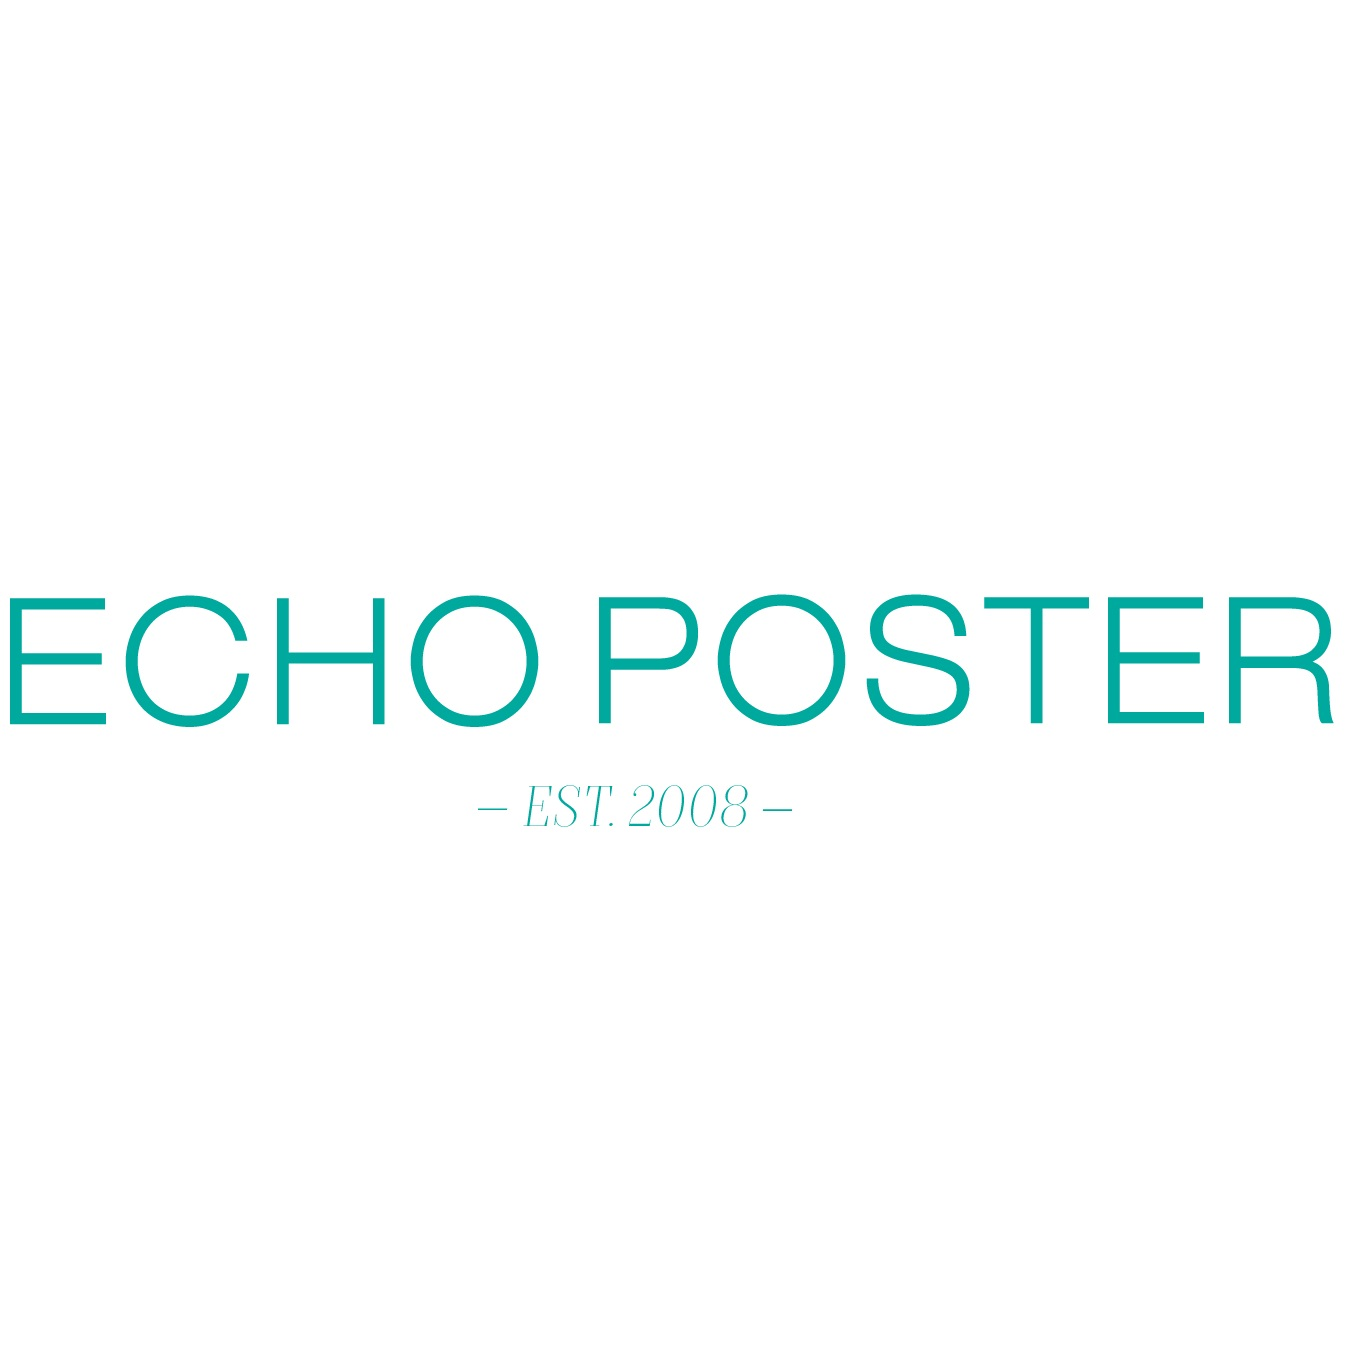 Echoposter Plakatwerbung Berlin